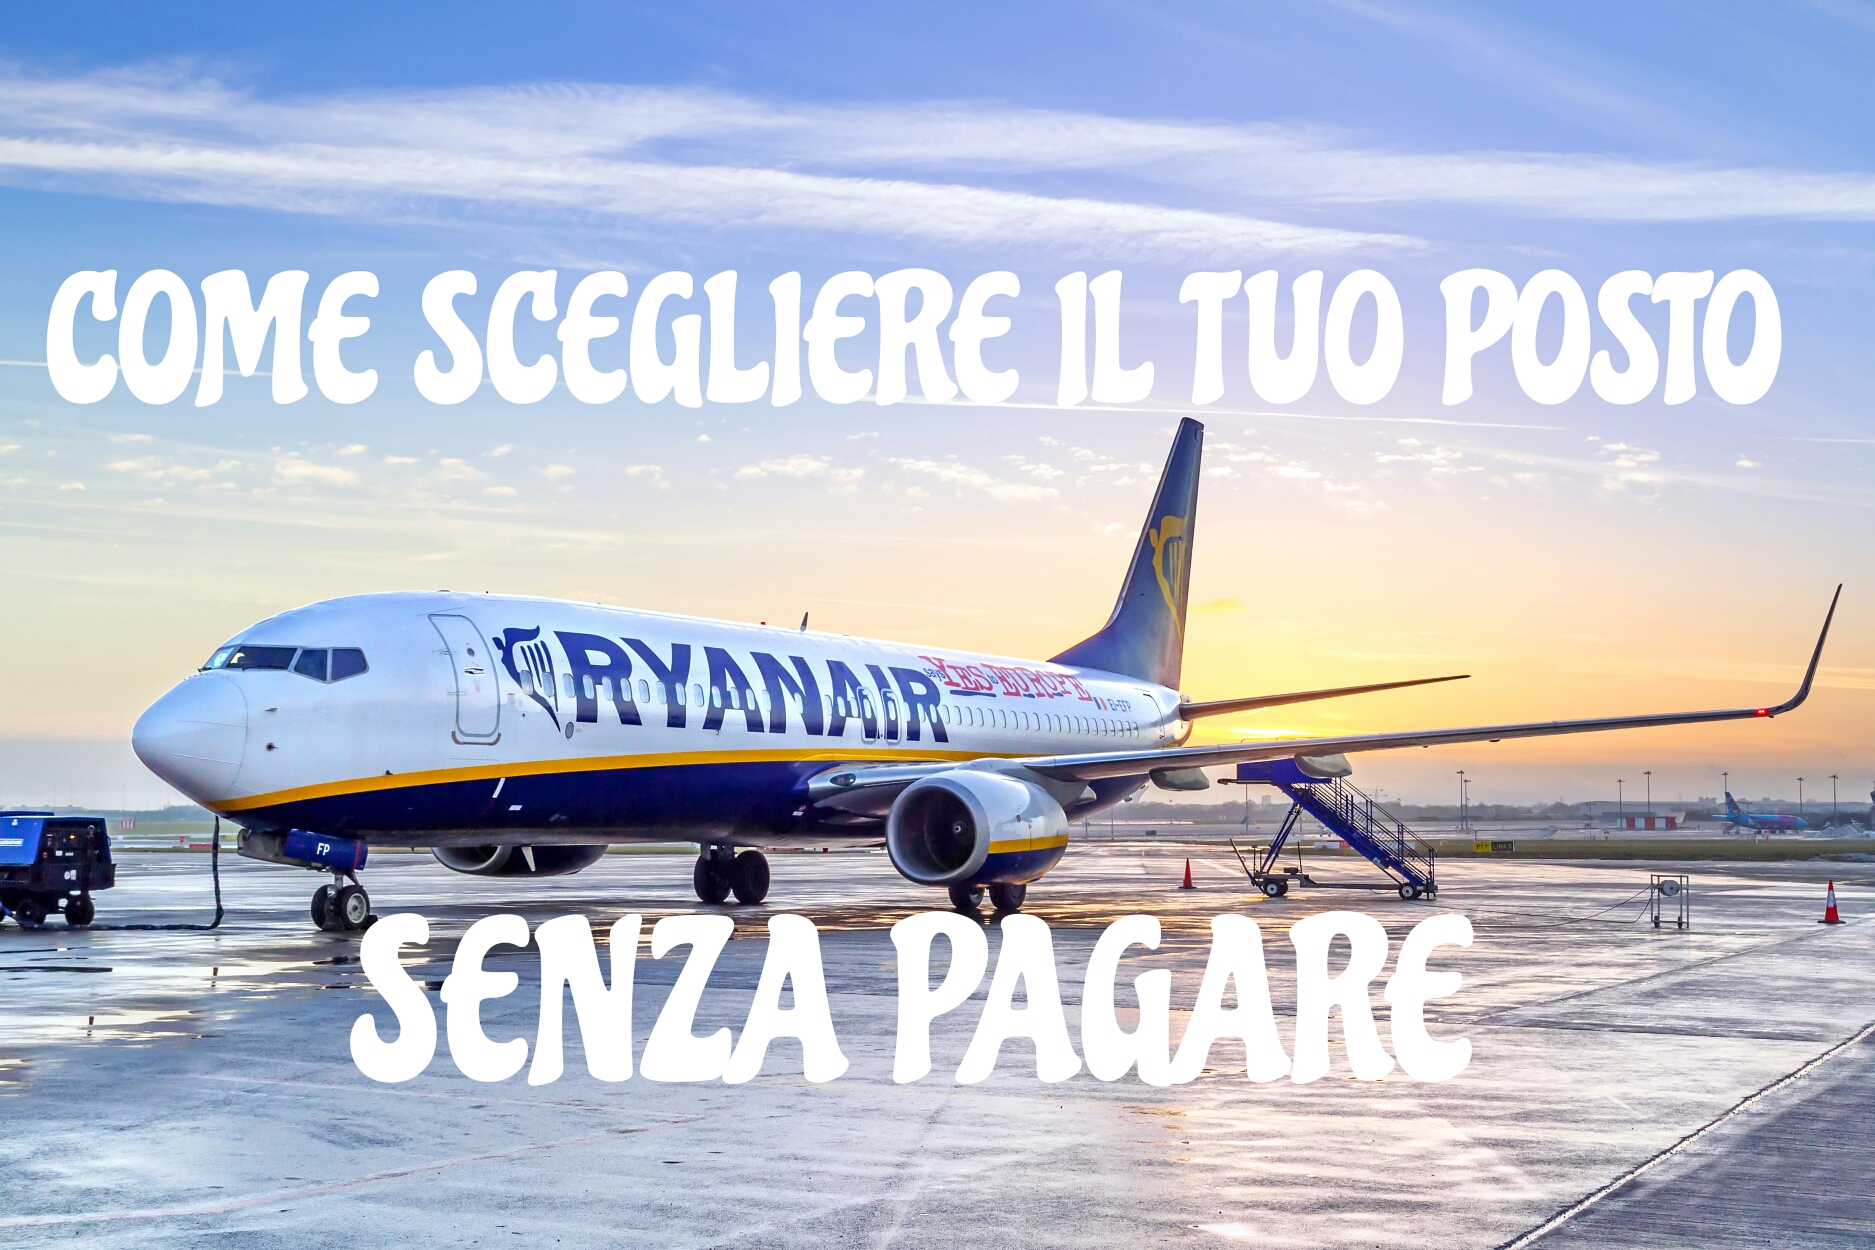 posto Ryanair senza pagare